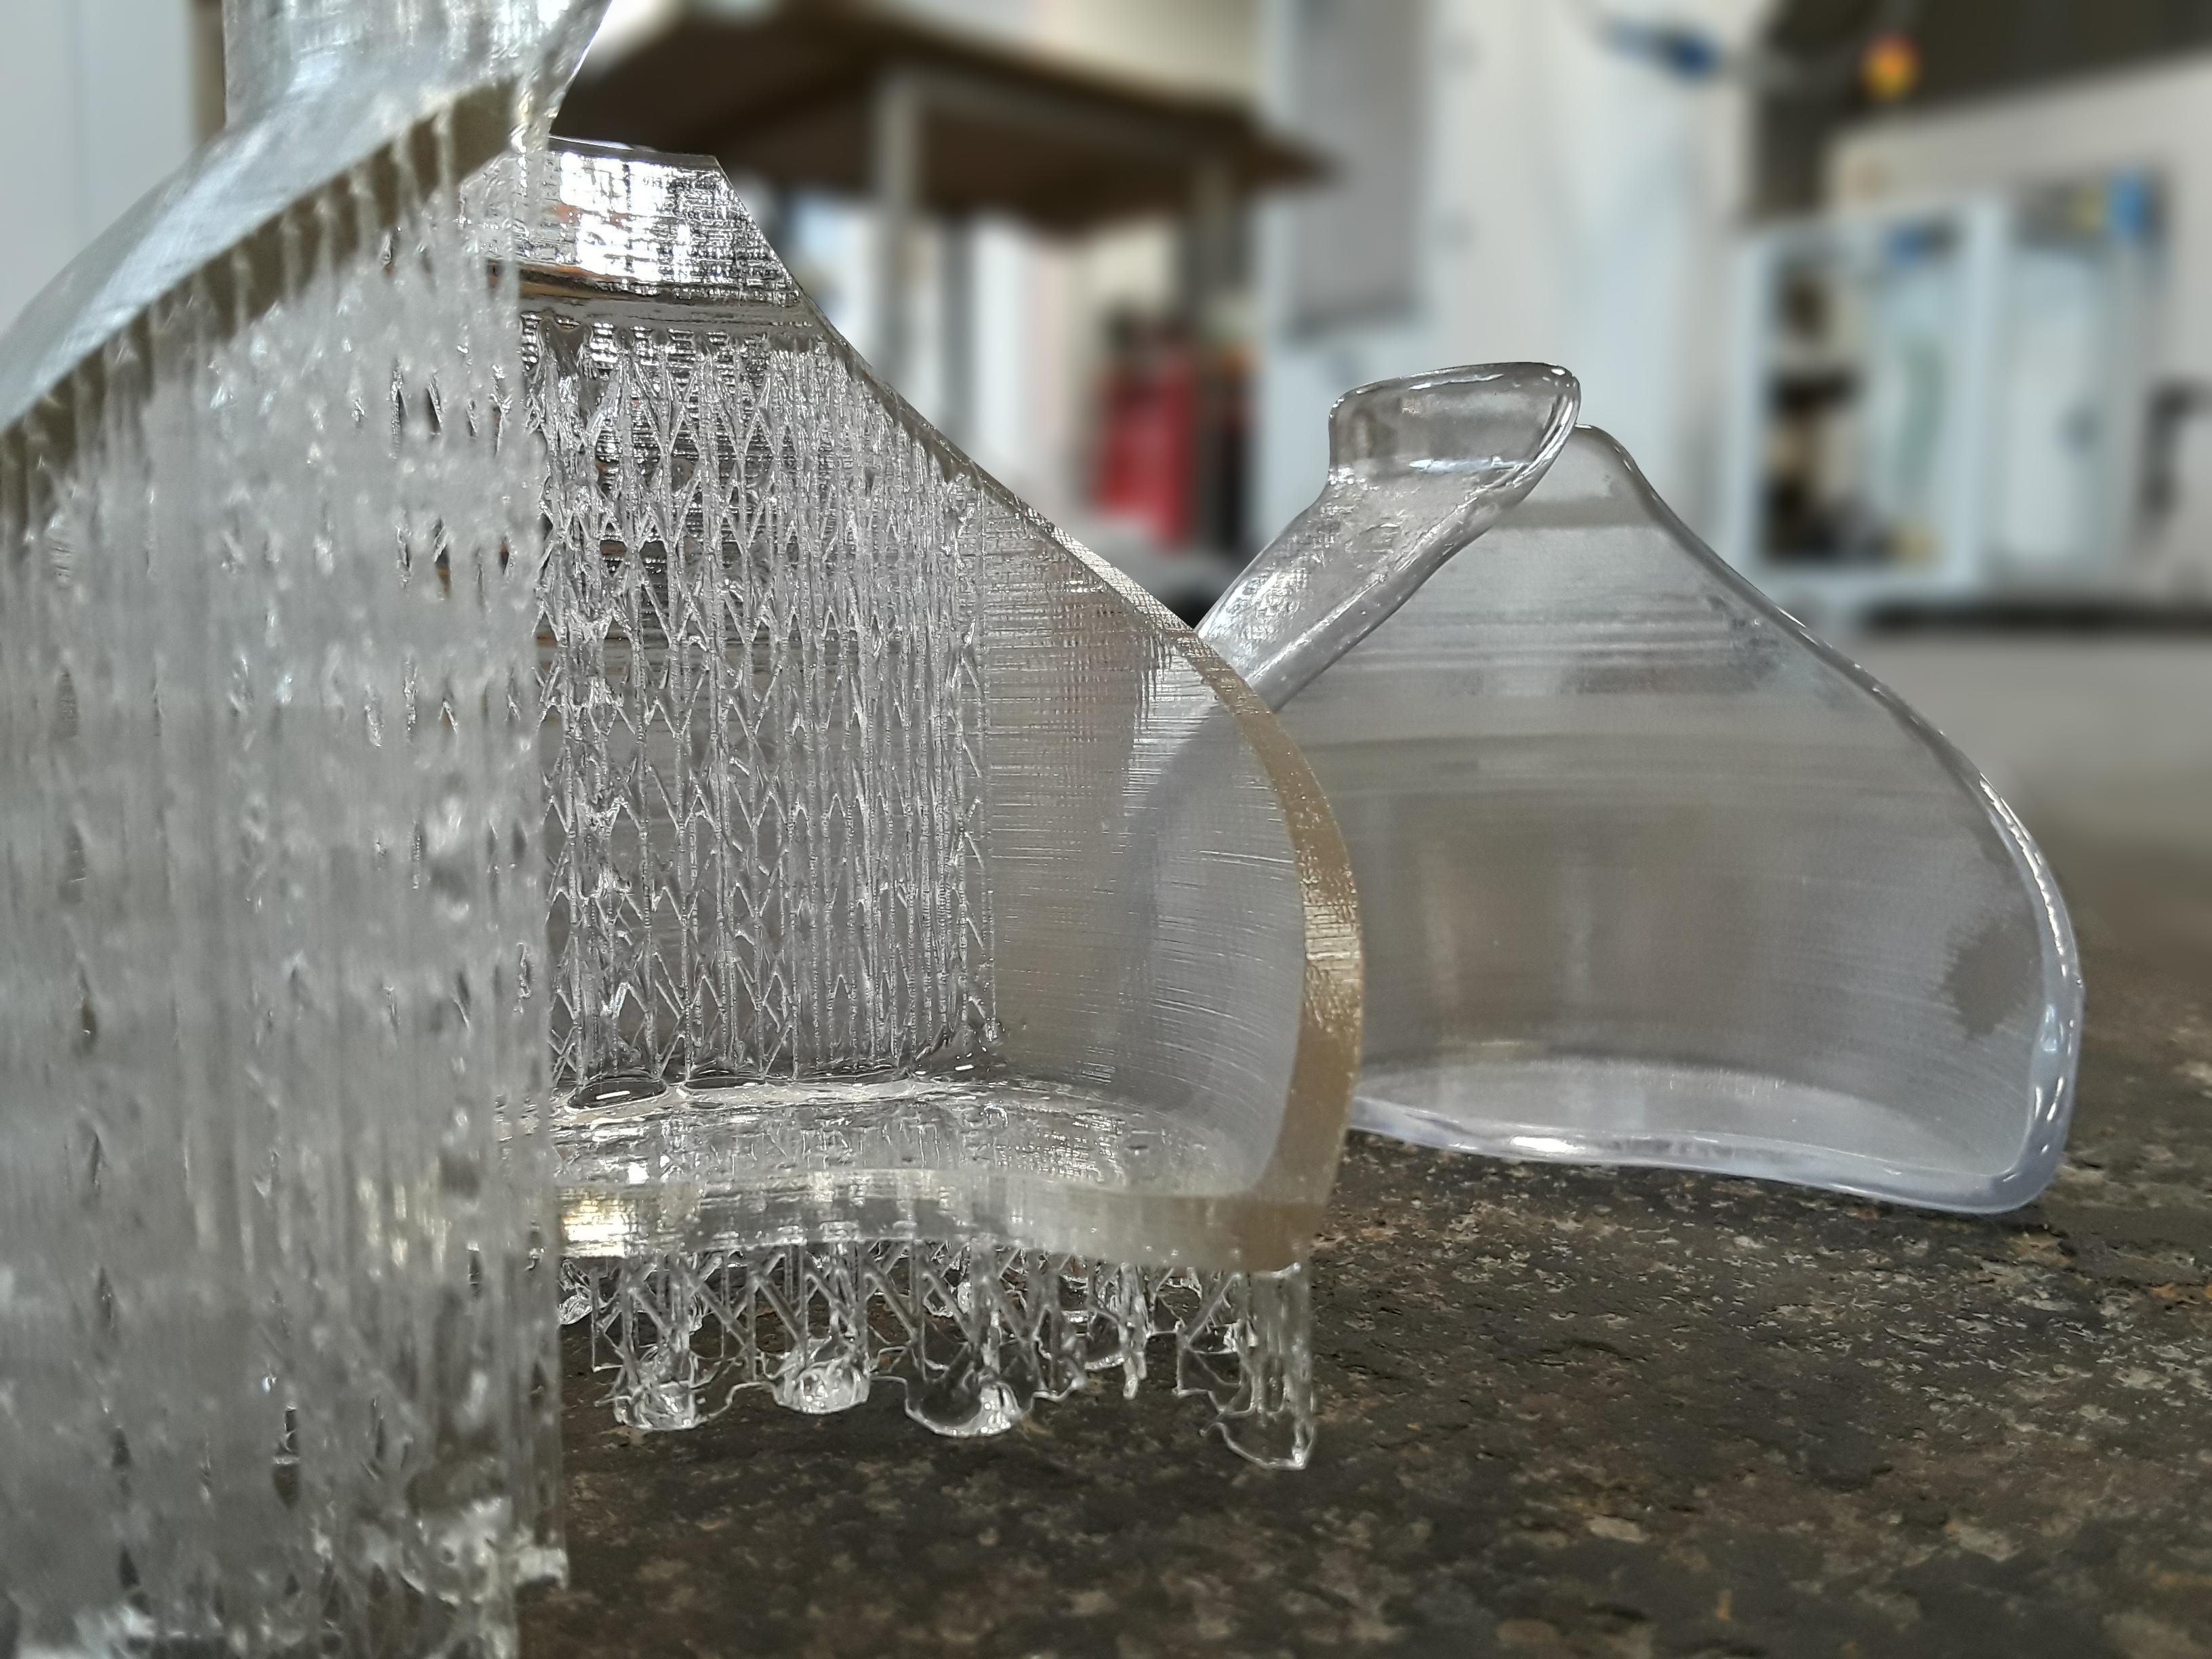 PostProcess develops swift solution for 3D printed SLA Resin